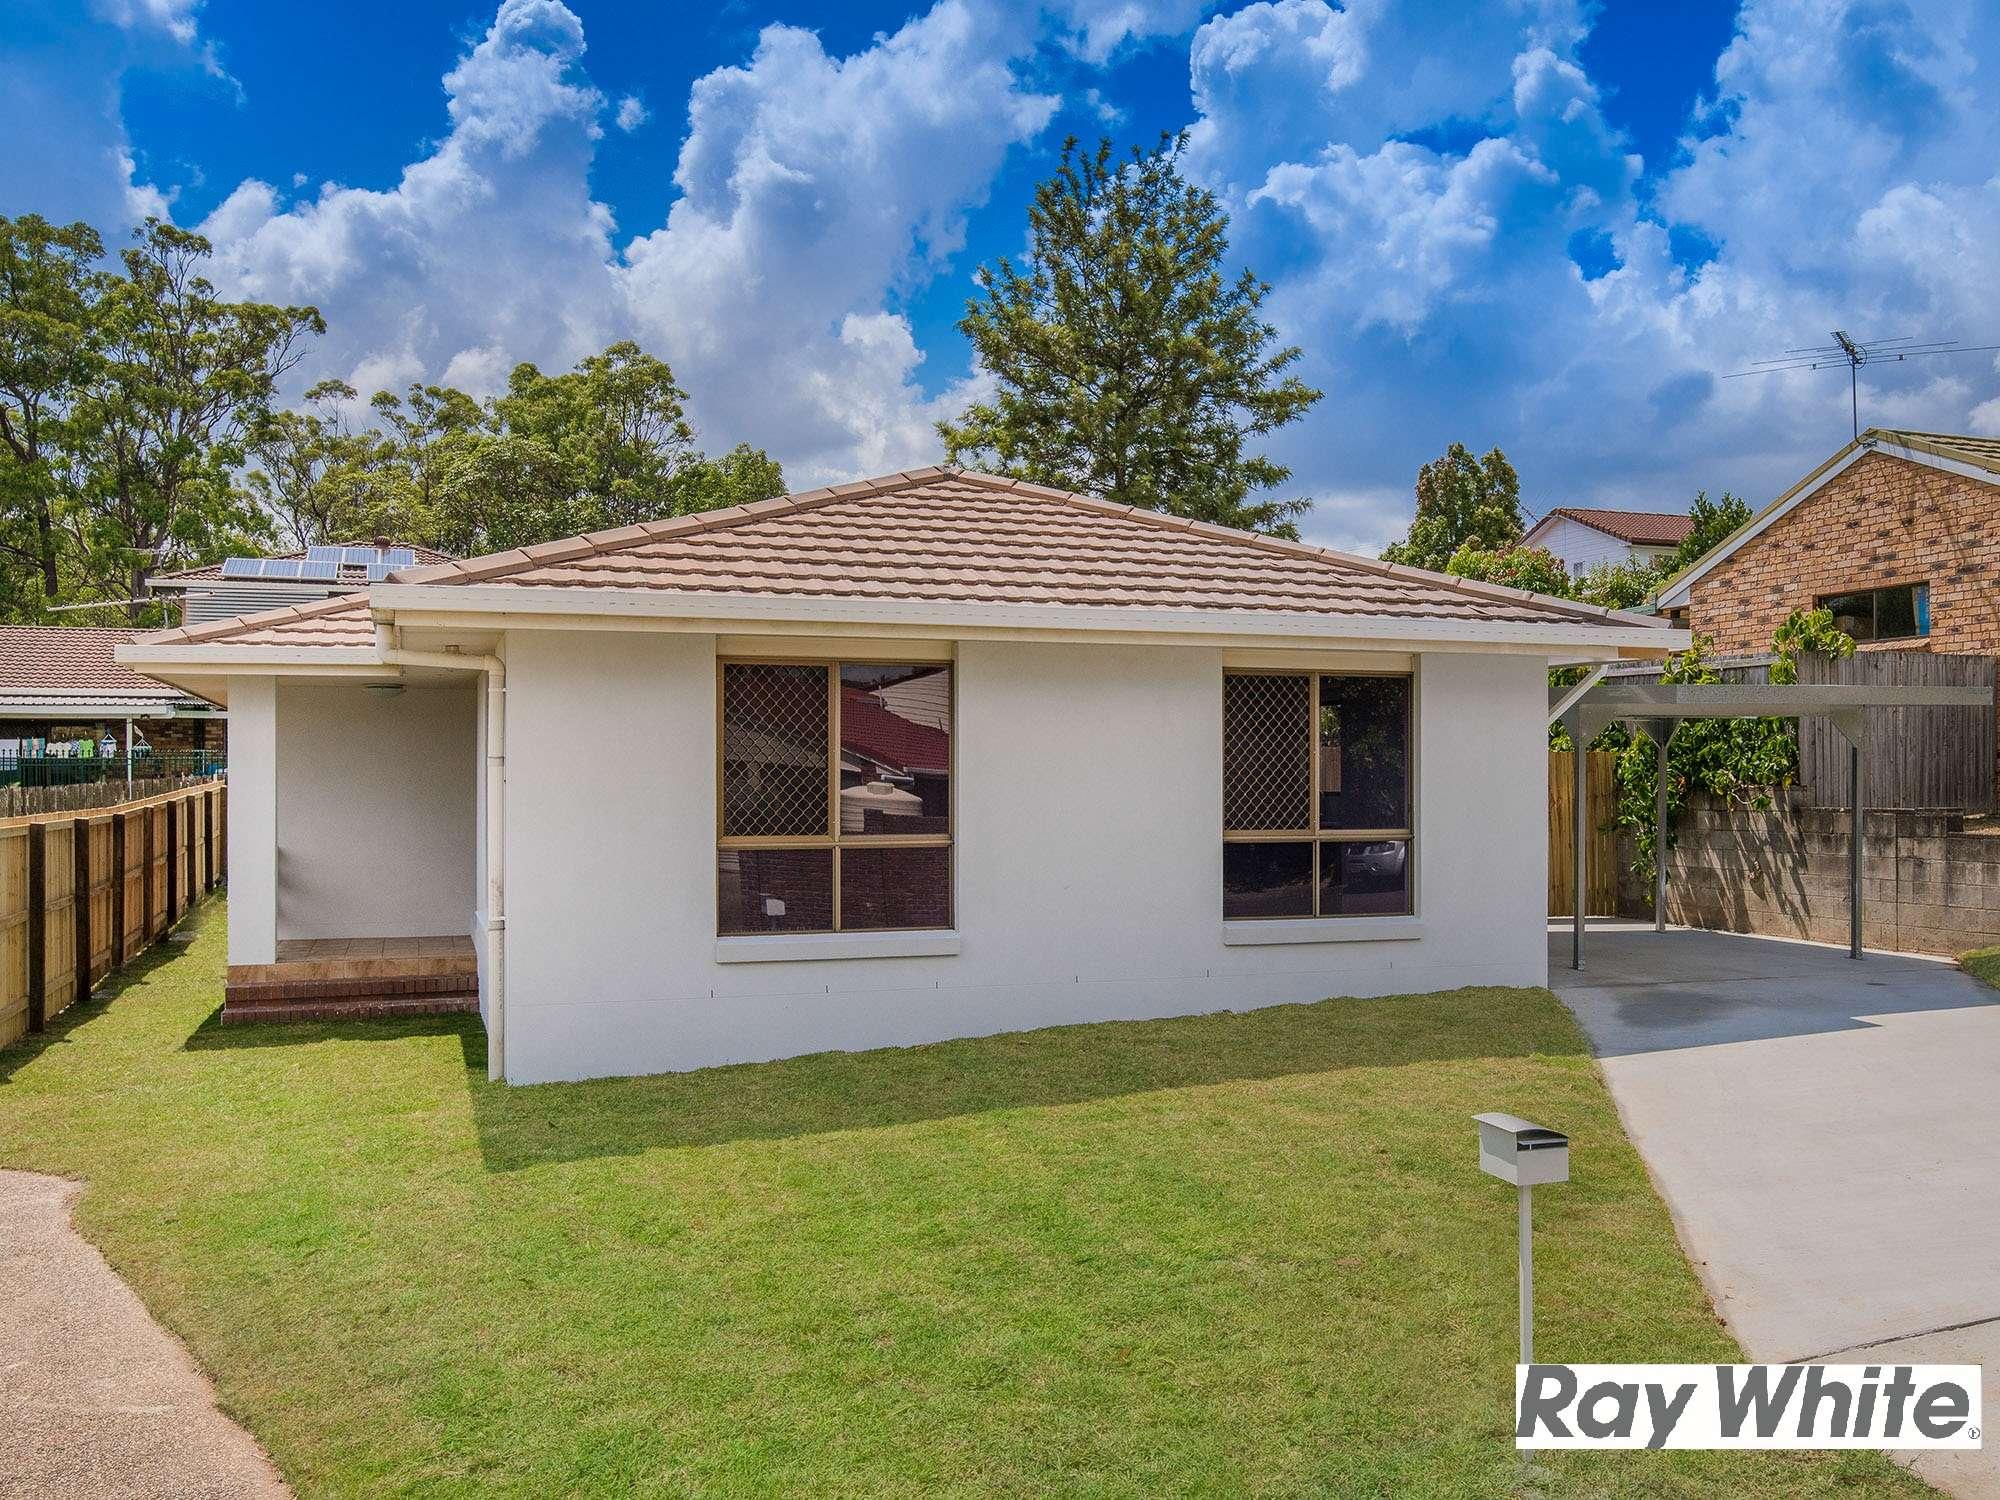 47 Cherrywood Street, Sunnybank Hills, QLD 4109